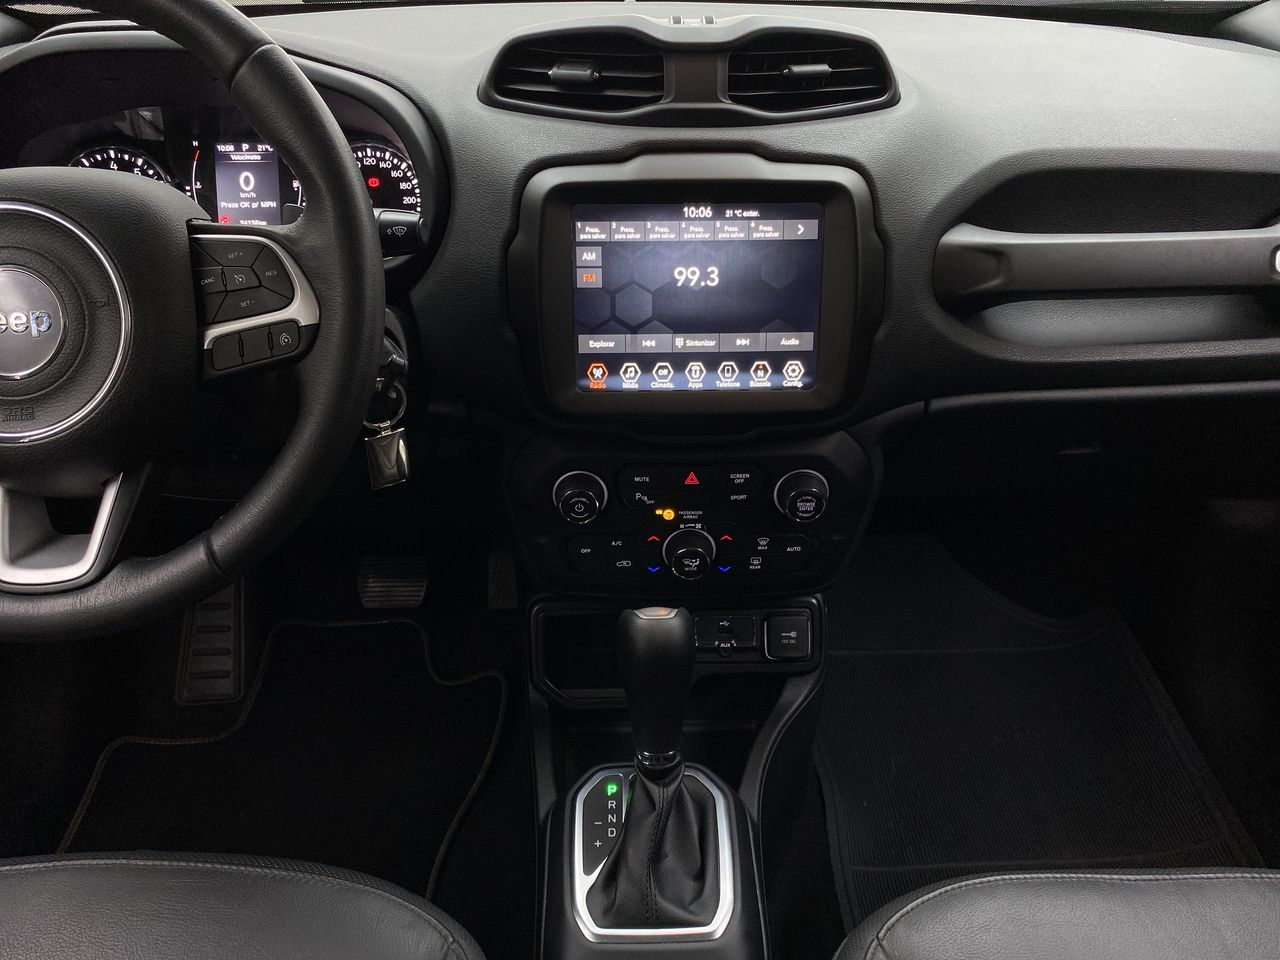 Renegade Longitude 1.8 4x2 Flex 16V Aut.